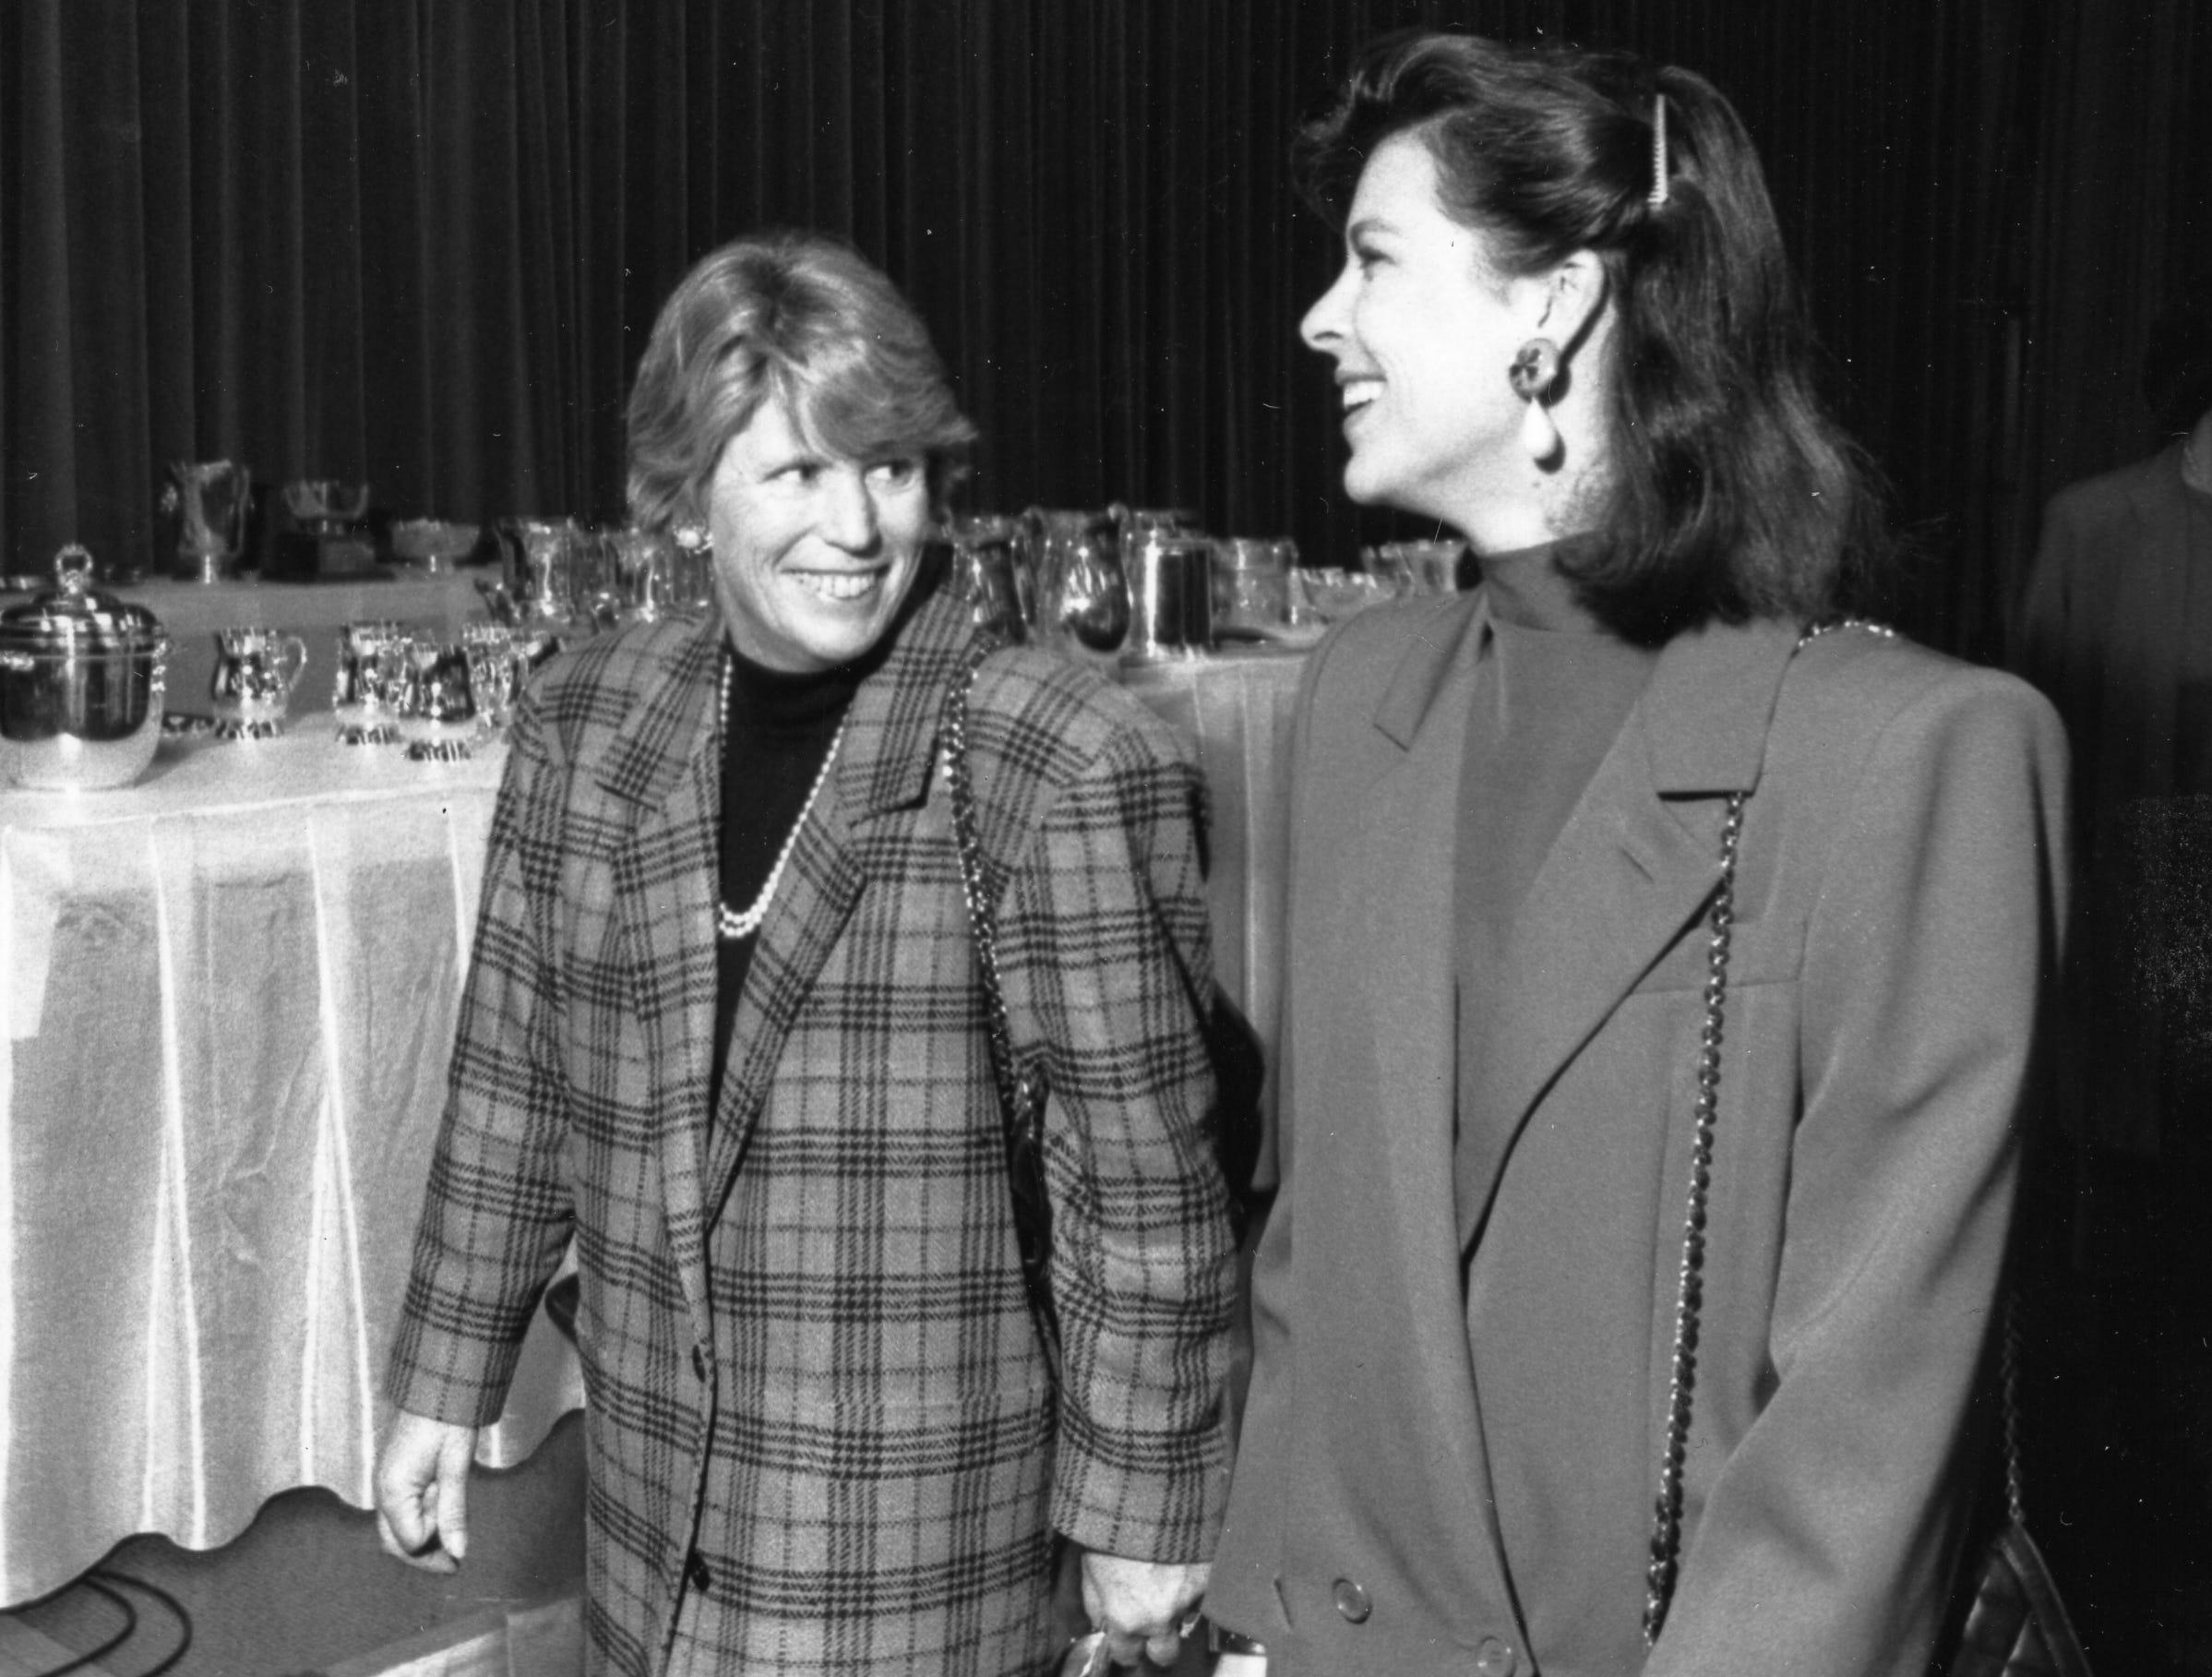 Marban Sparkman, left, president of the Garden Club of Philadelphia, accompanied by Princess Caroline of Monaco at the 1990 Philadelphia Flower Show awards luncheon.